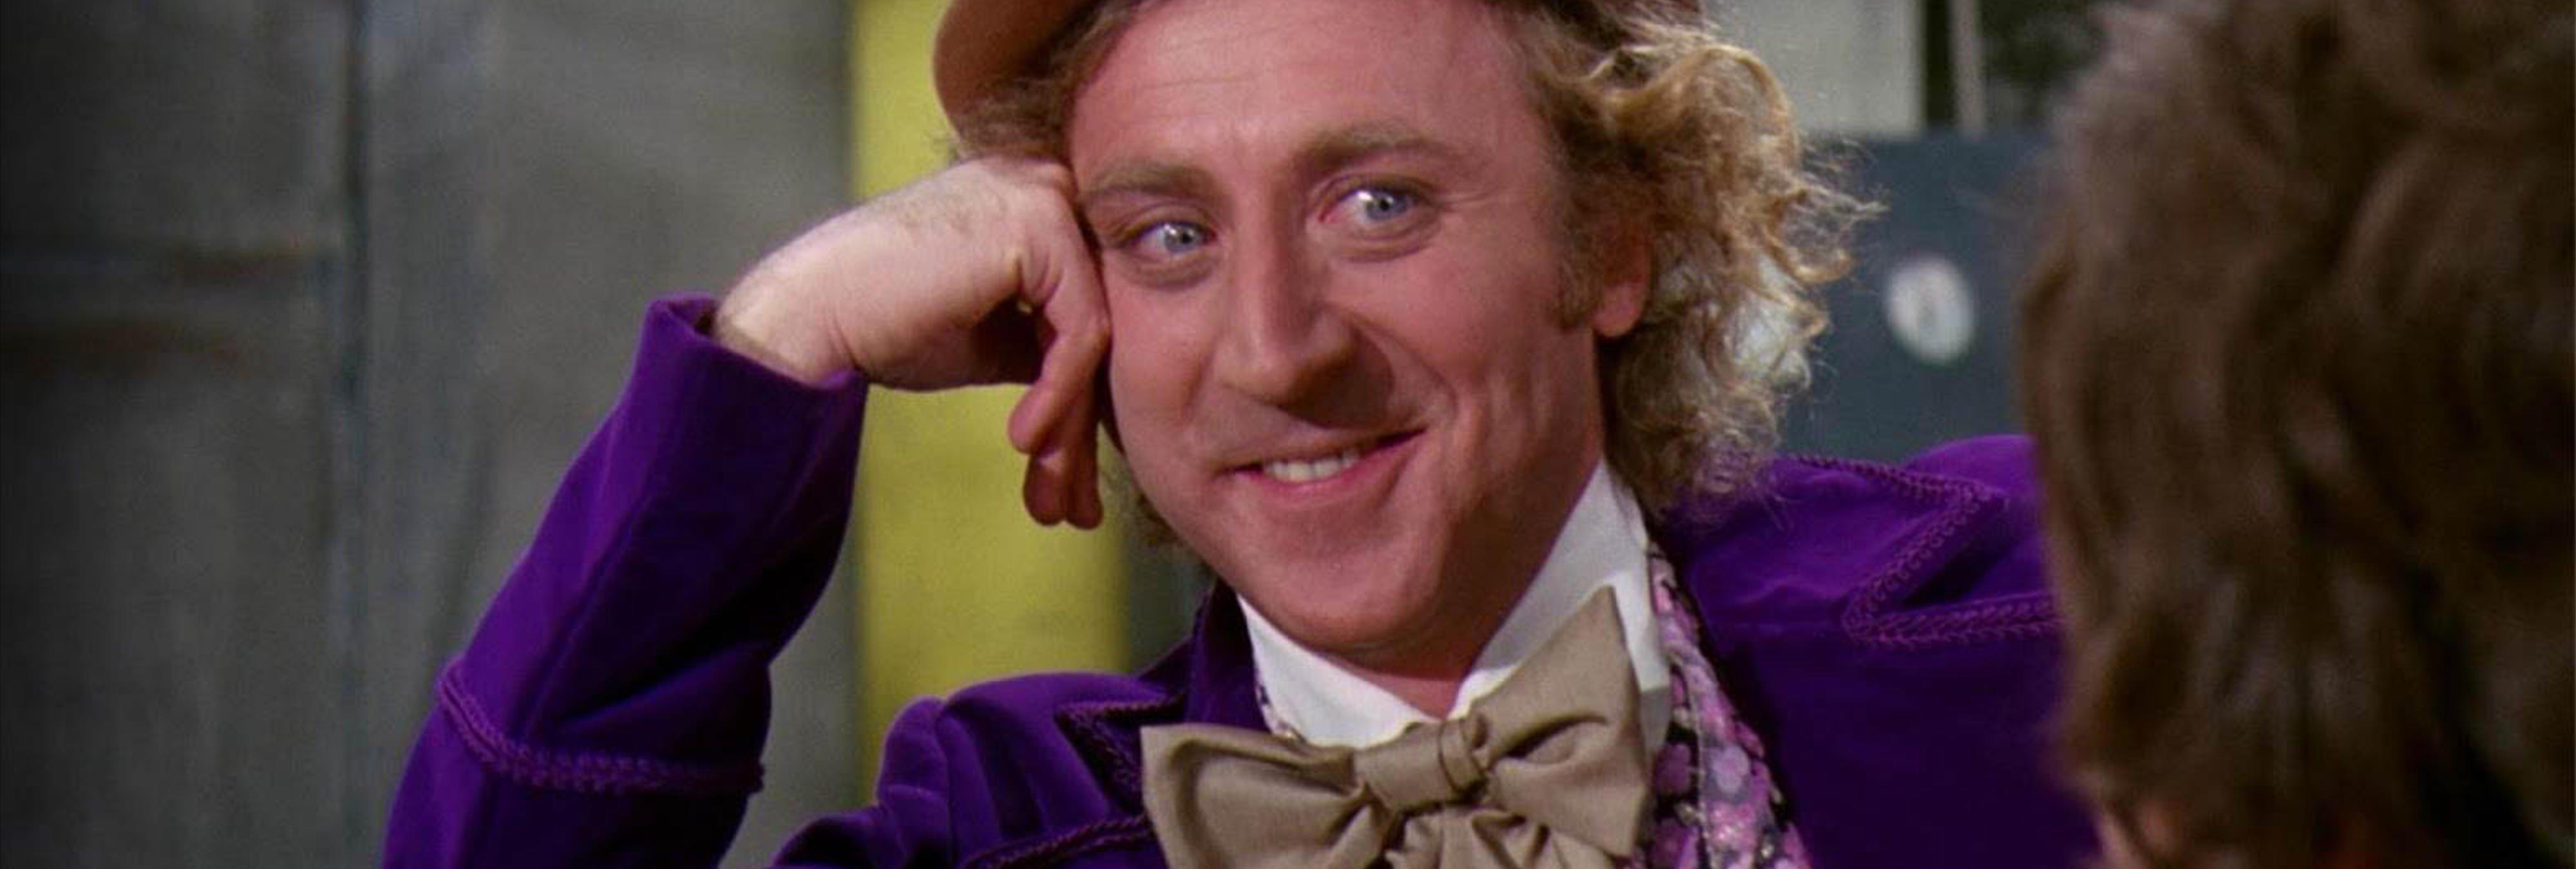 Los mejores memes de Willy Wonka para recordar a Gene Wilder